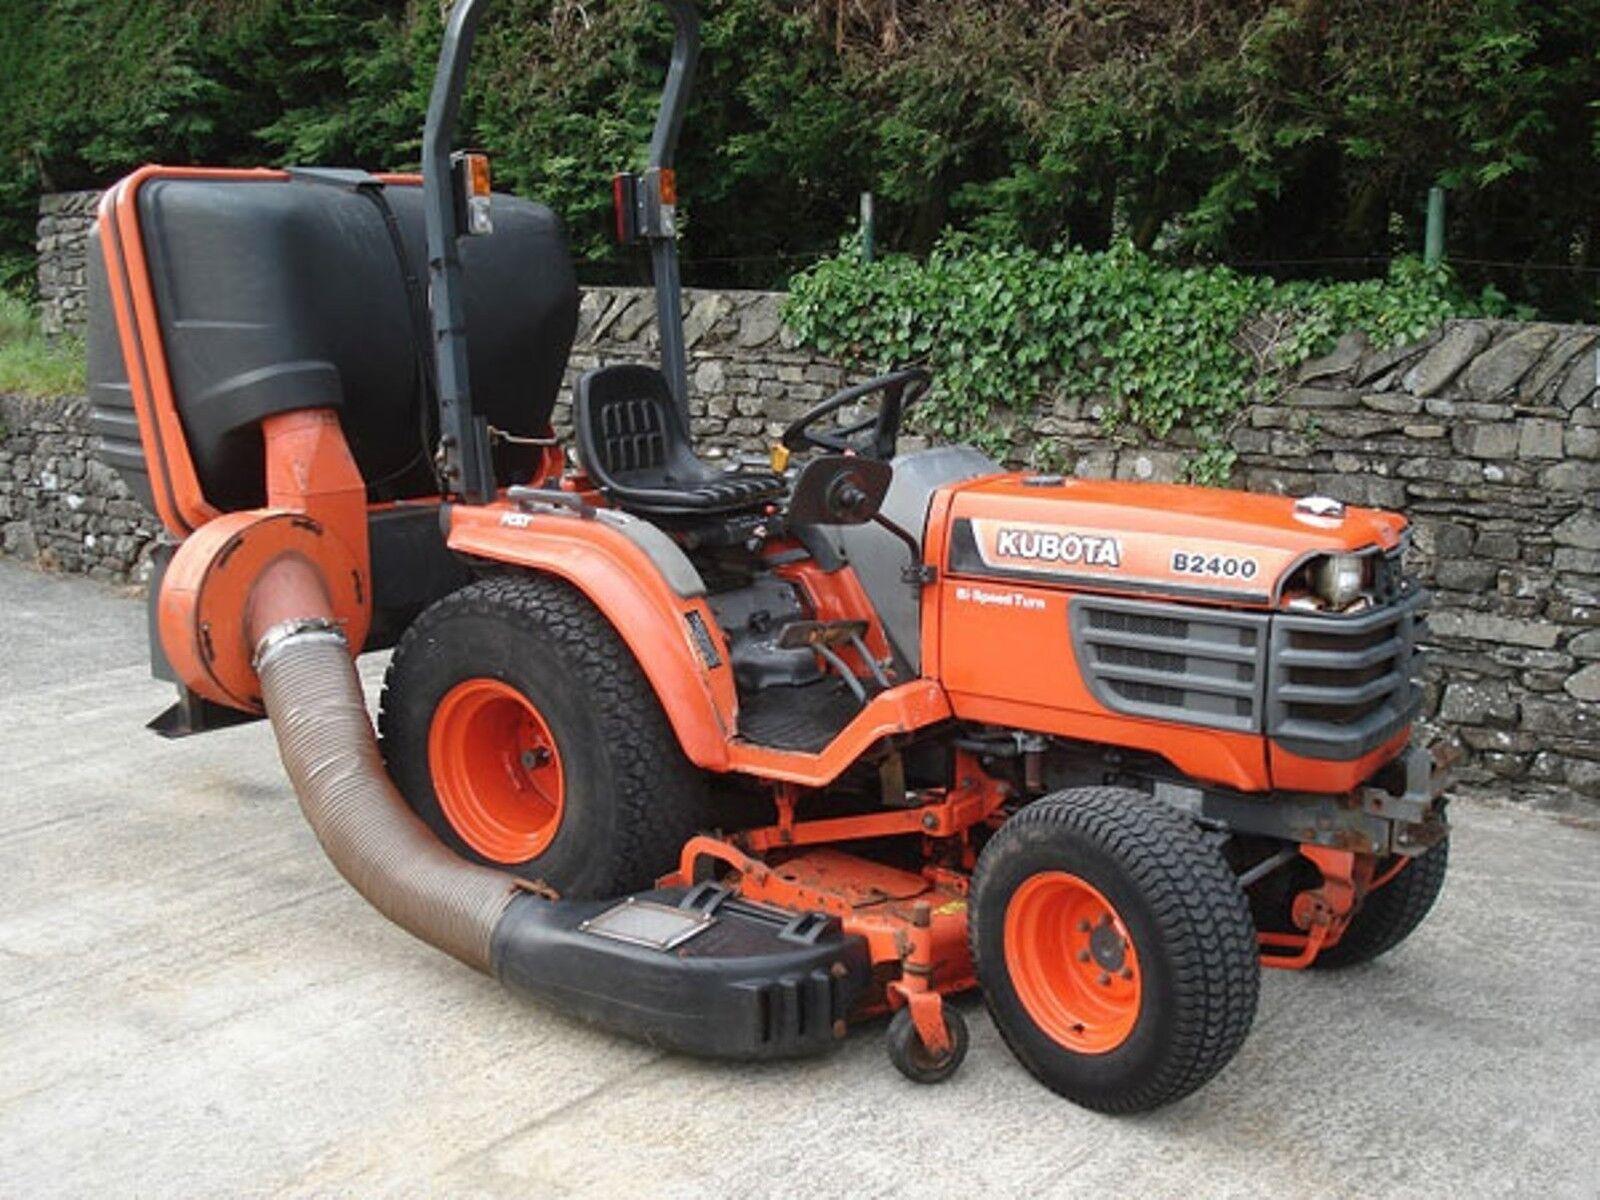 Kubota Tractor Service Manual B 2400 Car Owners B1700 Wiring Diagram B2100 B2400 Tractors Workshop Eur 8 45 Rh Picclick Fr L3450 Diagrams